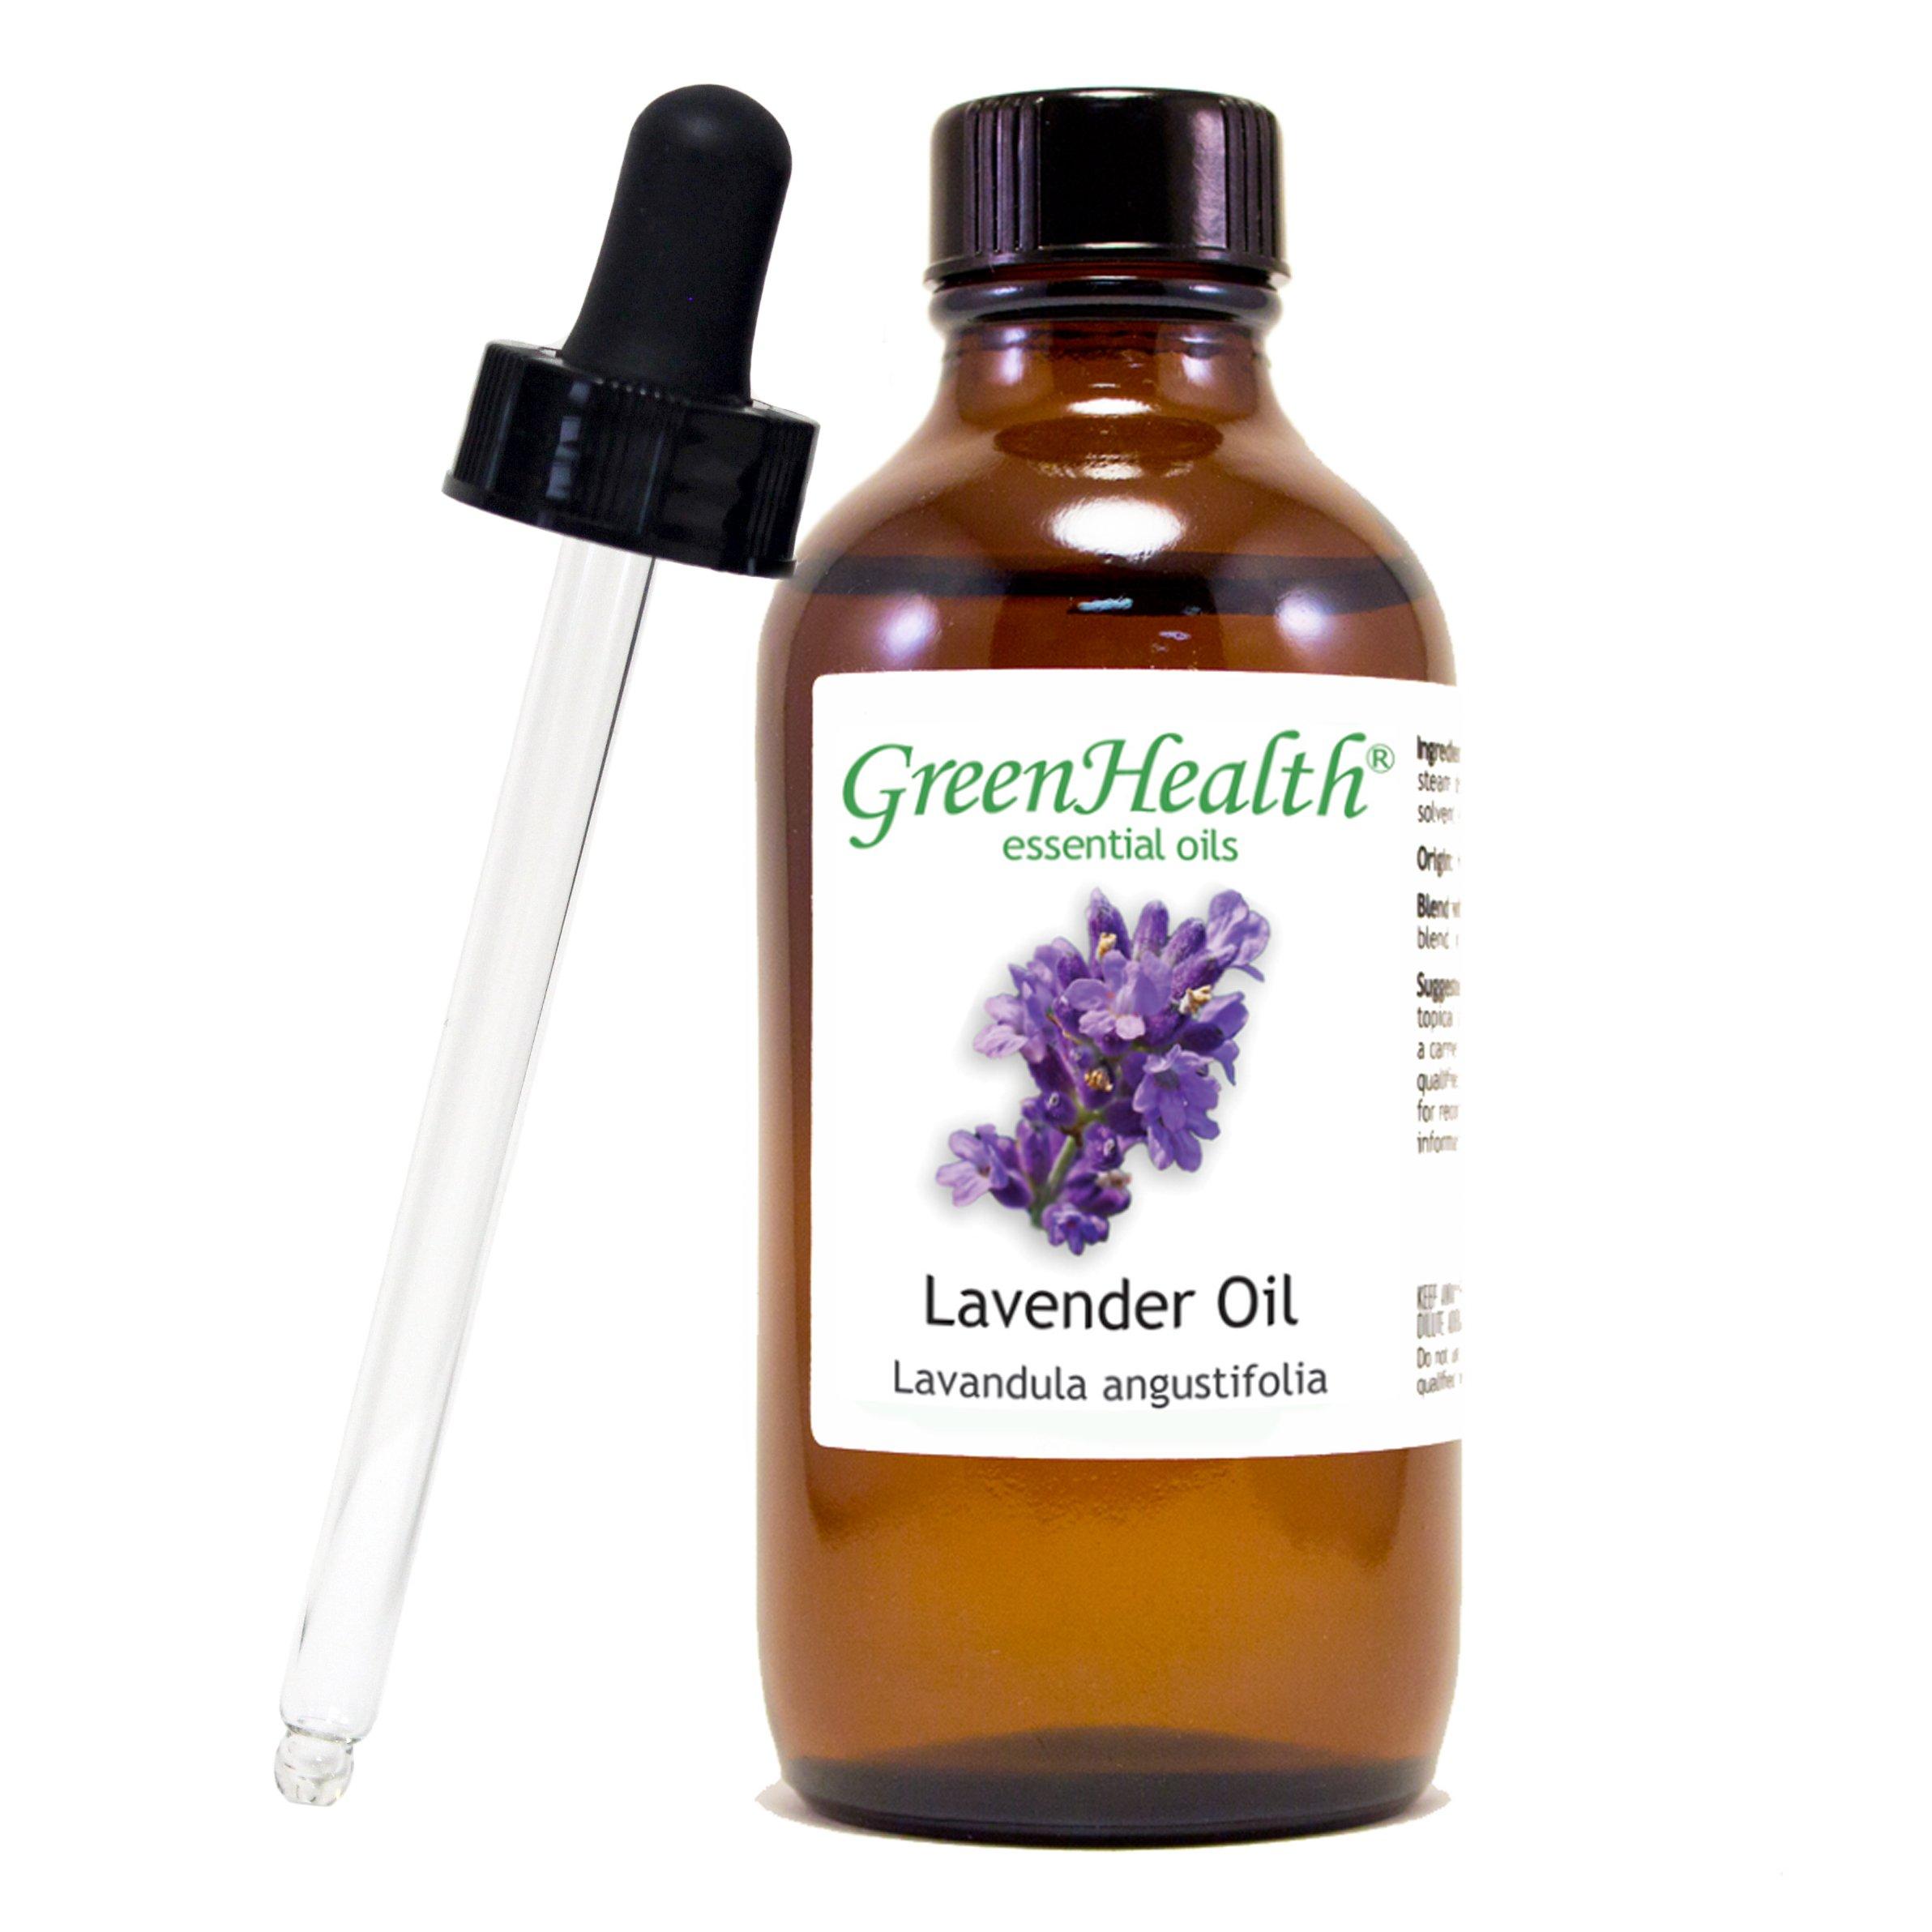 GreenHealth - Lavender Essential Oil, 100% Pure & Natural – 4 fl oz (118 ml) Glass Bottle w/ Glass Dropper – 100% Pure Essential Oil